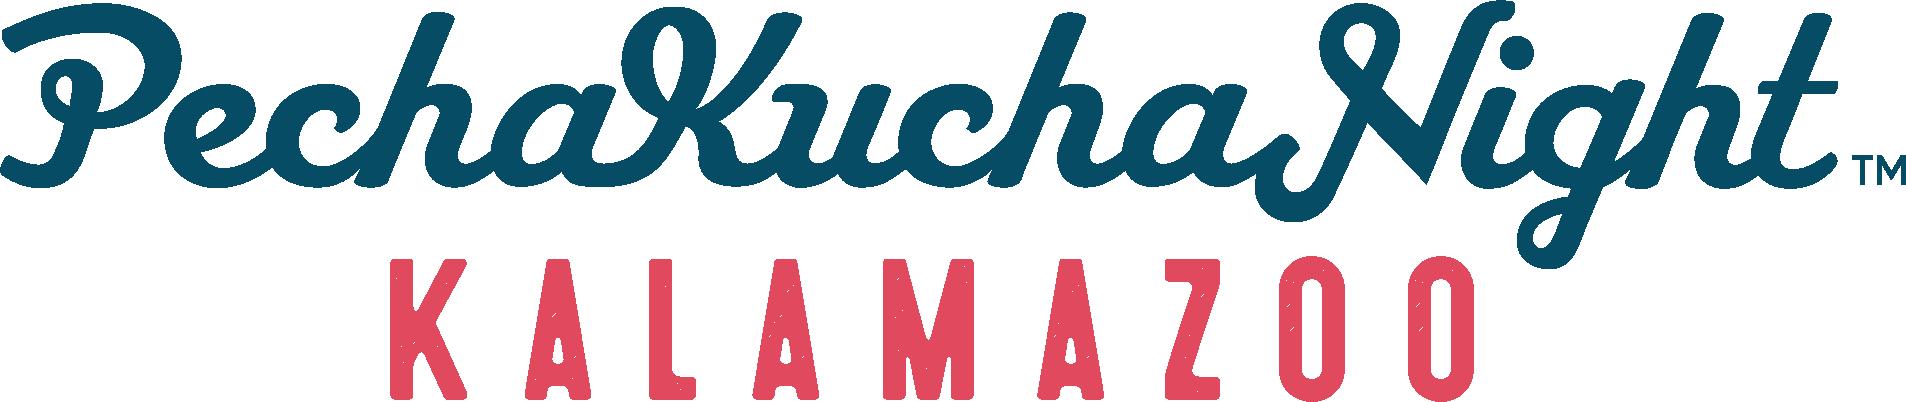 Pecha Kucha Kalamazoo Logo